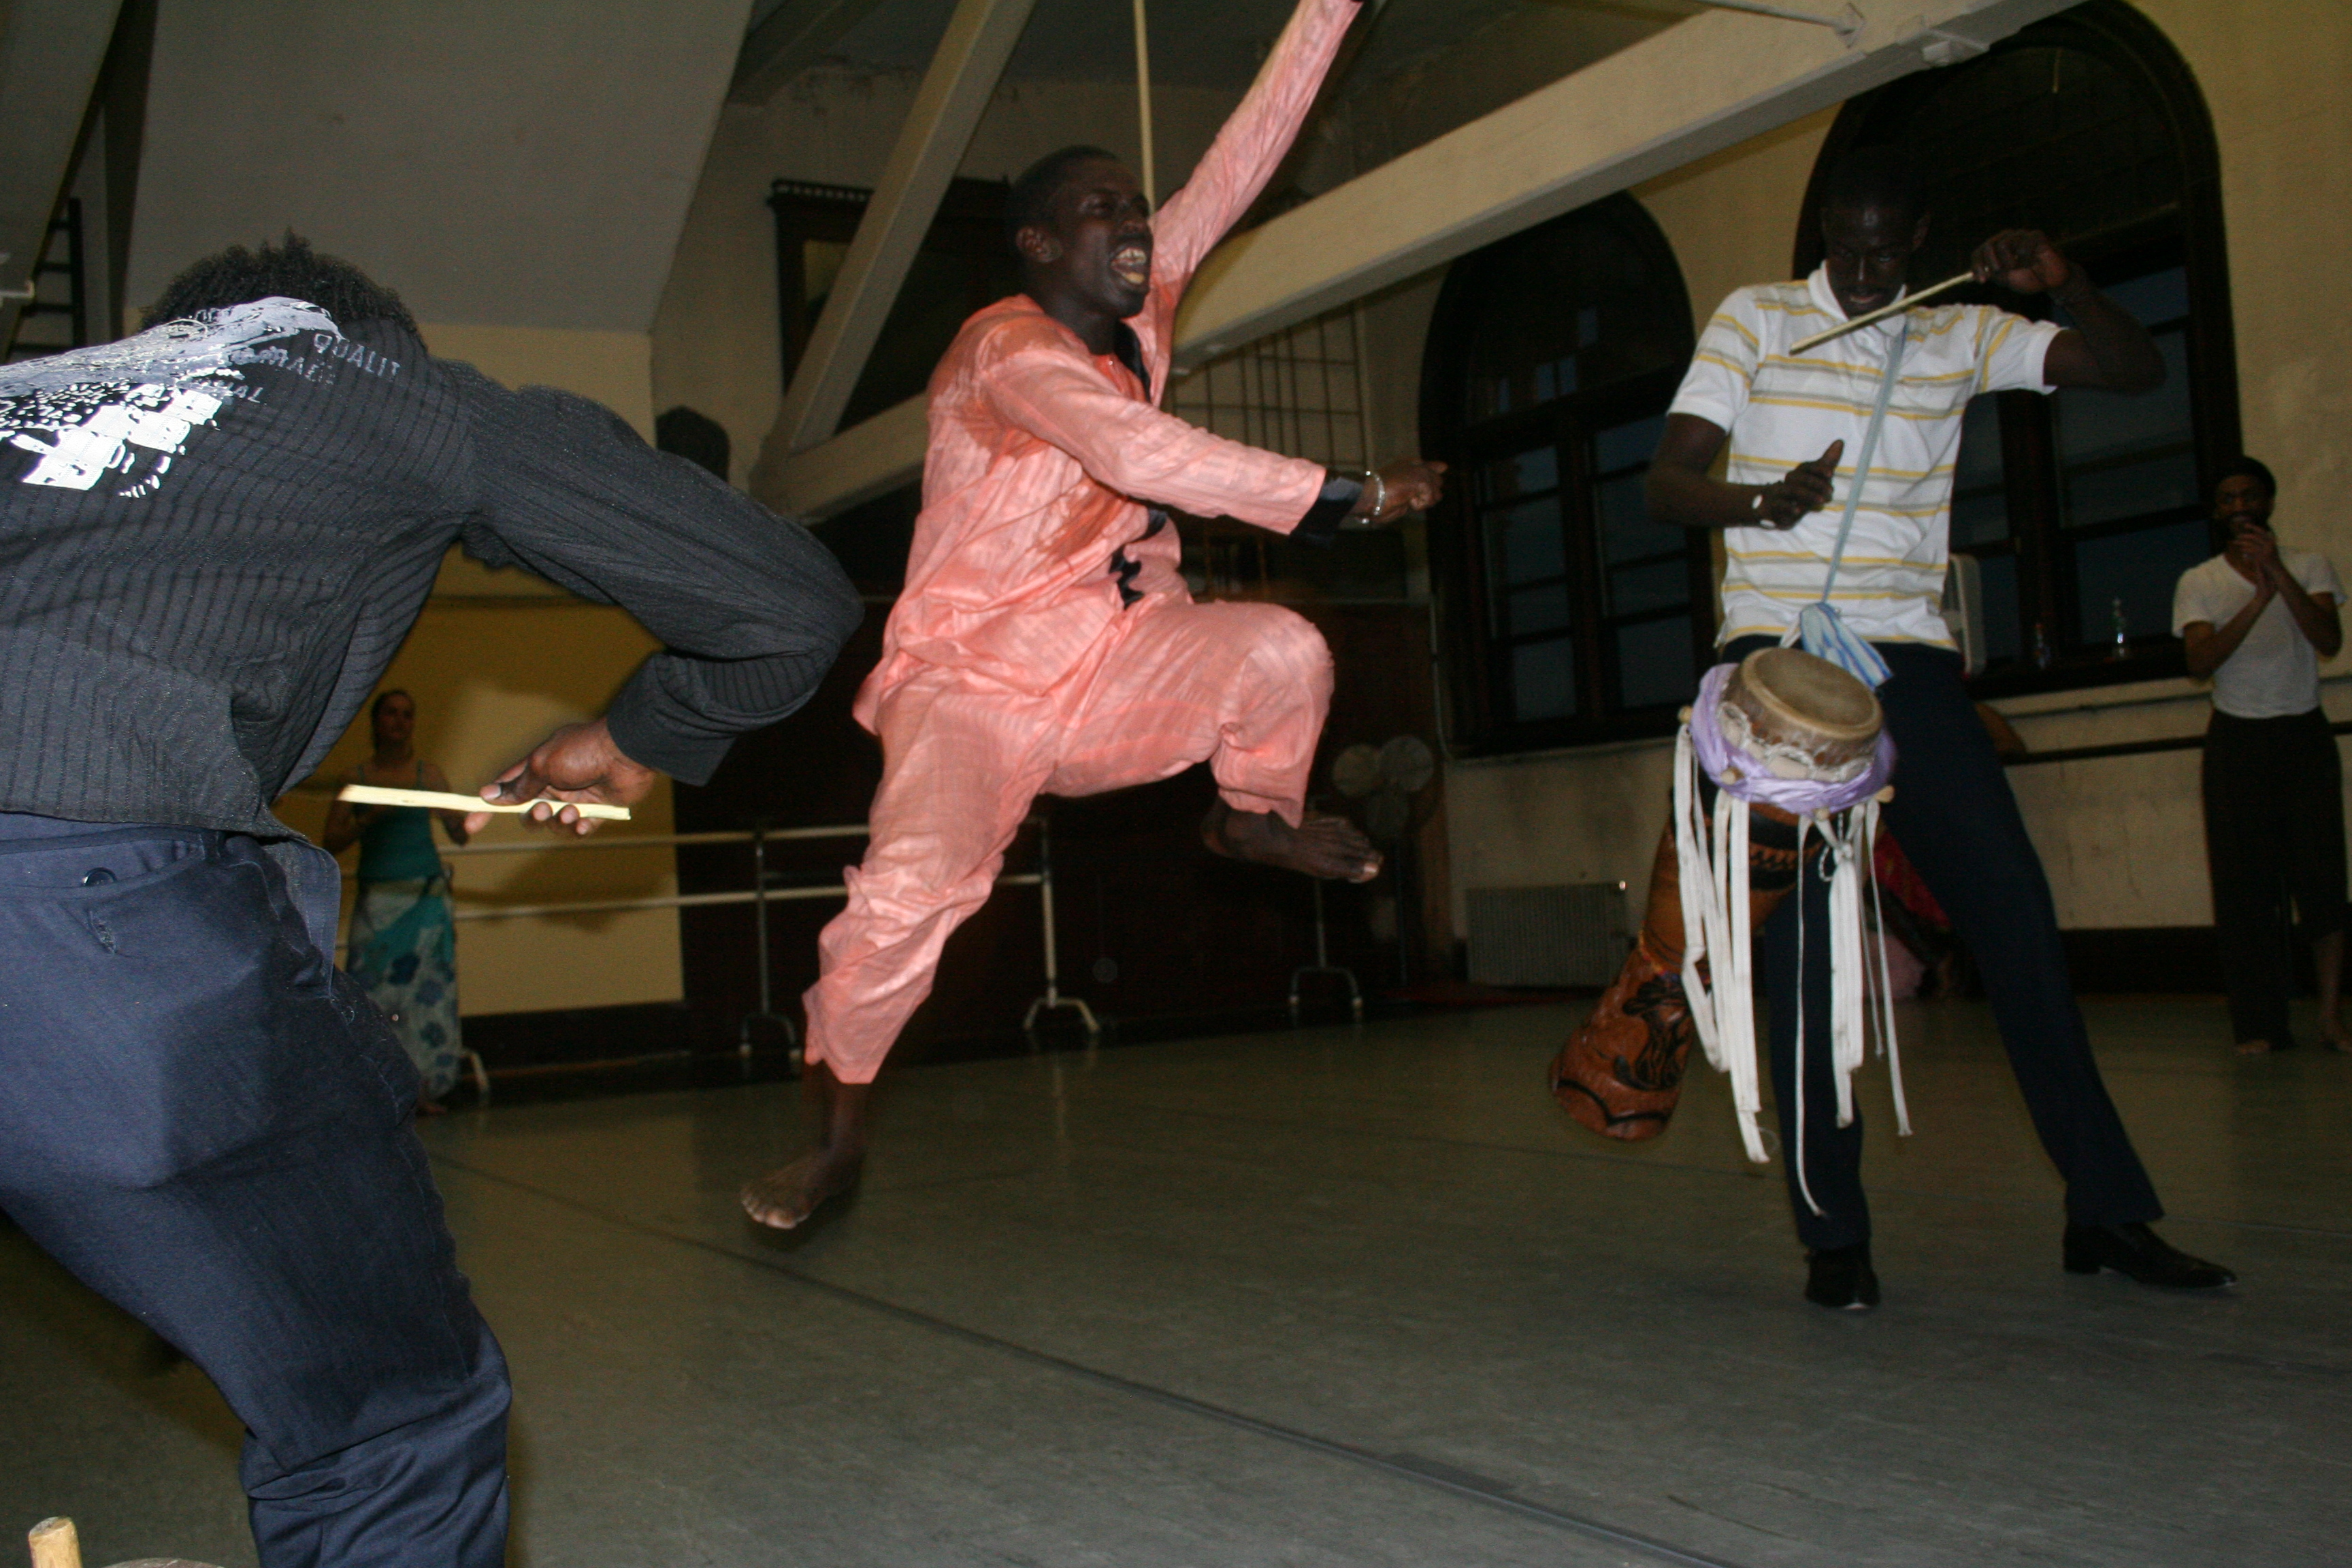 Moustapha and Aziz demonstrate sabar verite